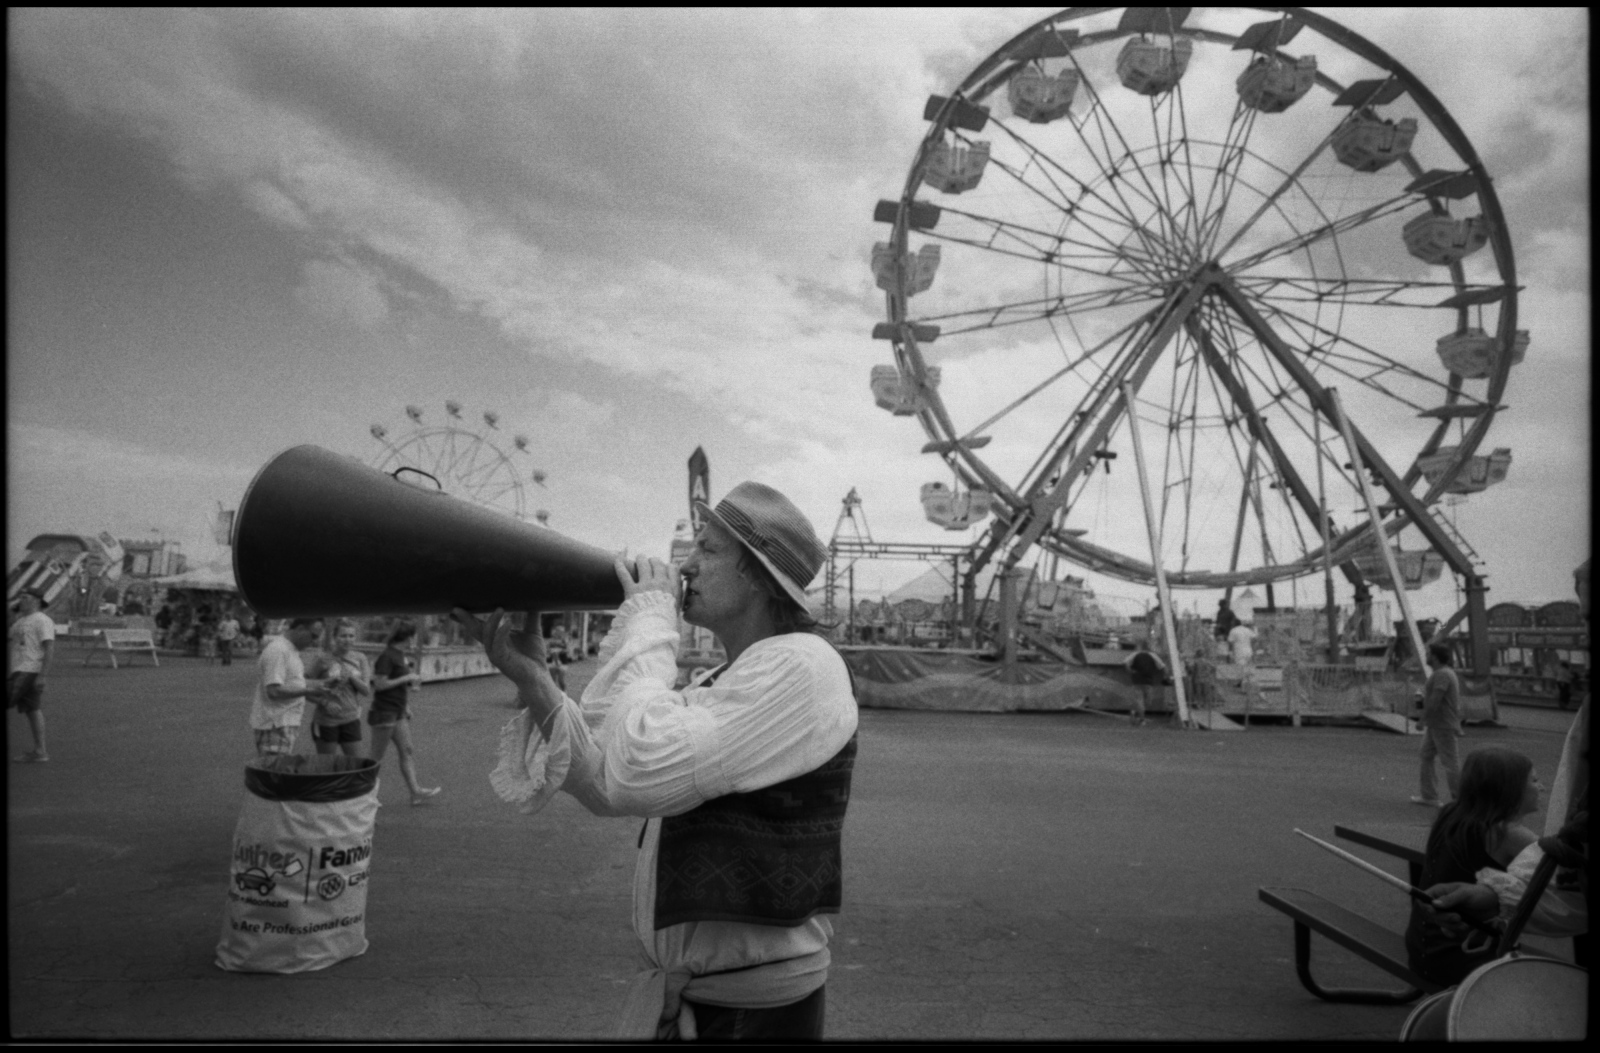 Giovanni Zoppé wrangling crowds, North Dakota State Fair, Fargo, ND. July 2015.